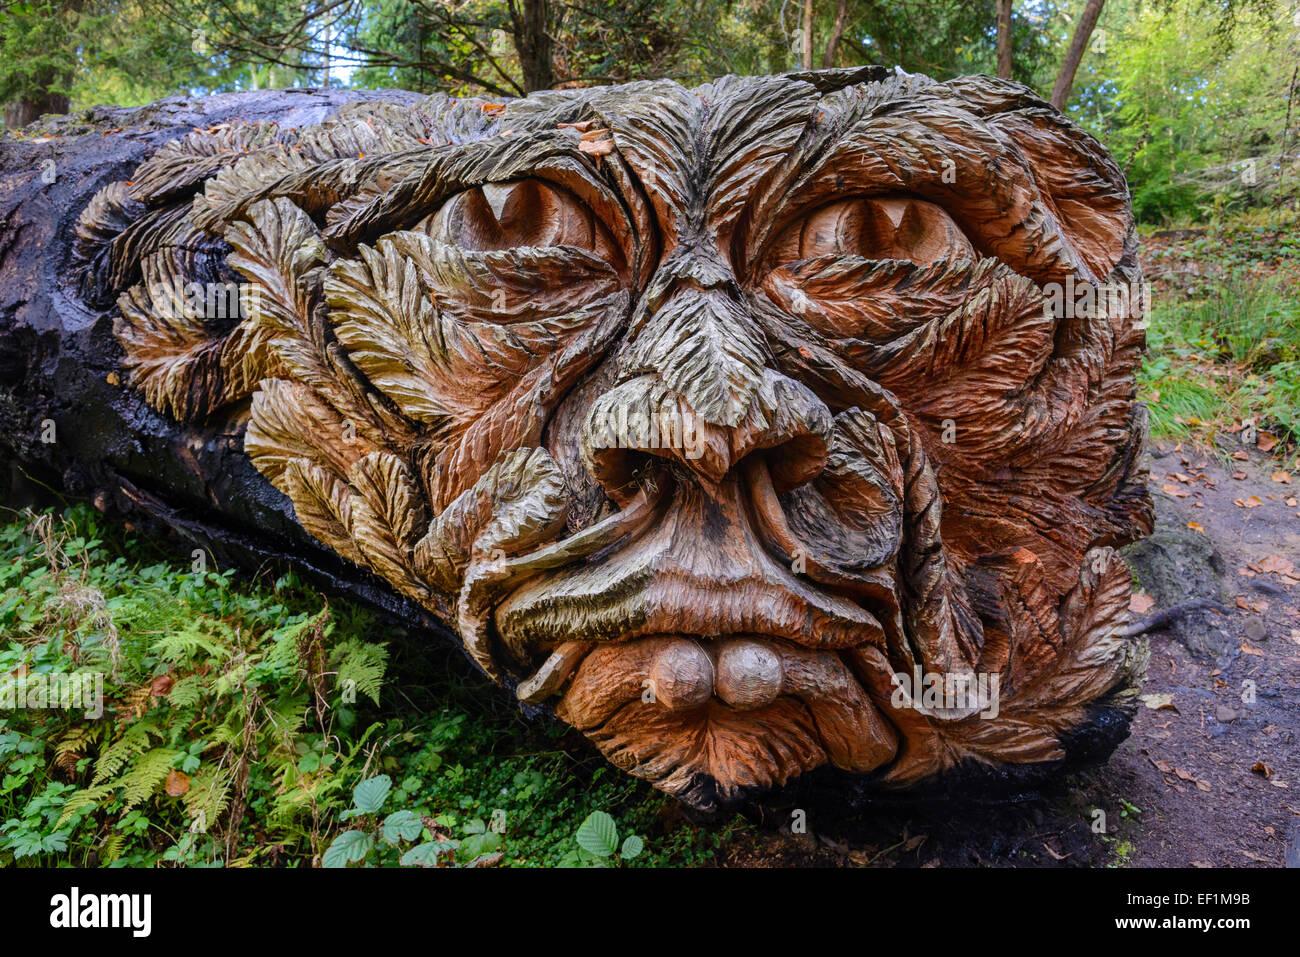 Wood carving, Cragside Gardens, Northumberland, England - Stock Image